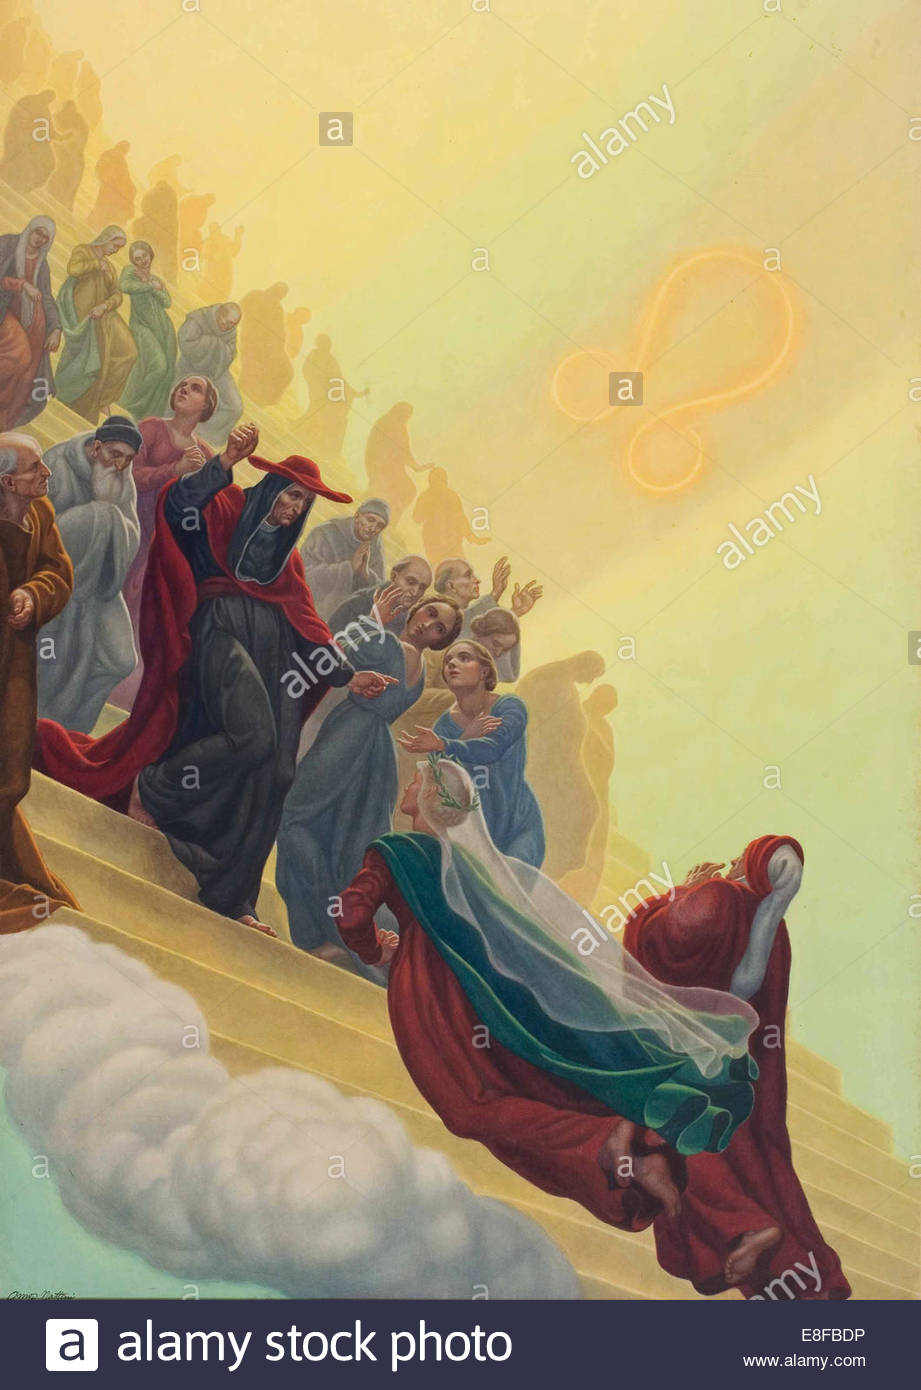 Illustration to the Divine Comedy by Dante Alighieri (Paradiso canto XXI). Artist: Nattini, Amos (1892-1985) - Stock Image